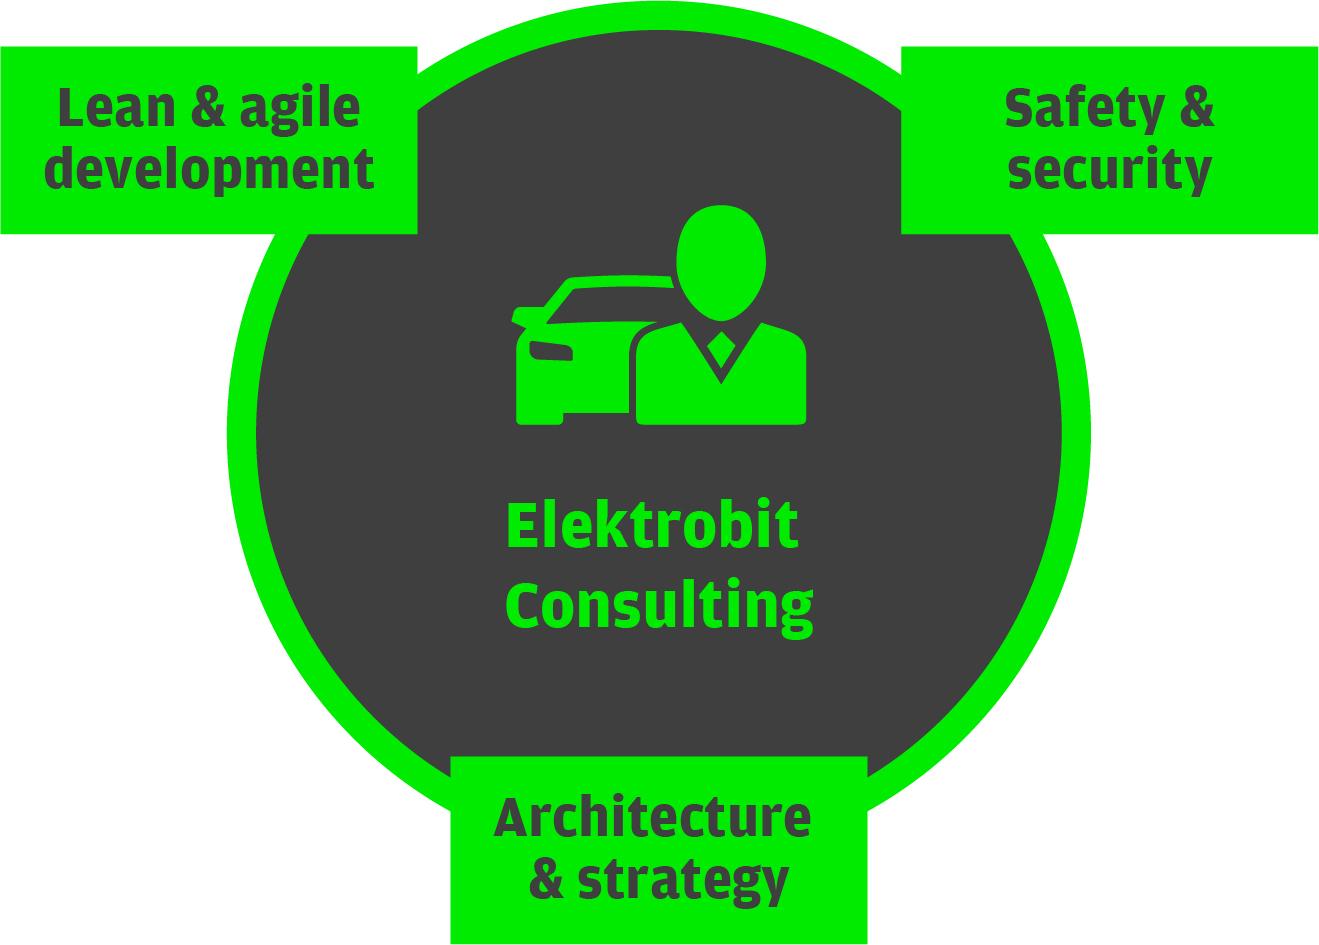 Elektrobit Consulting